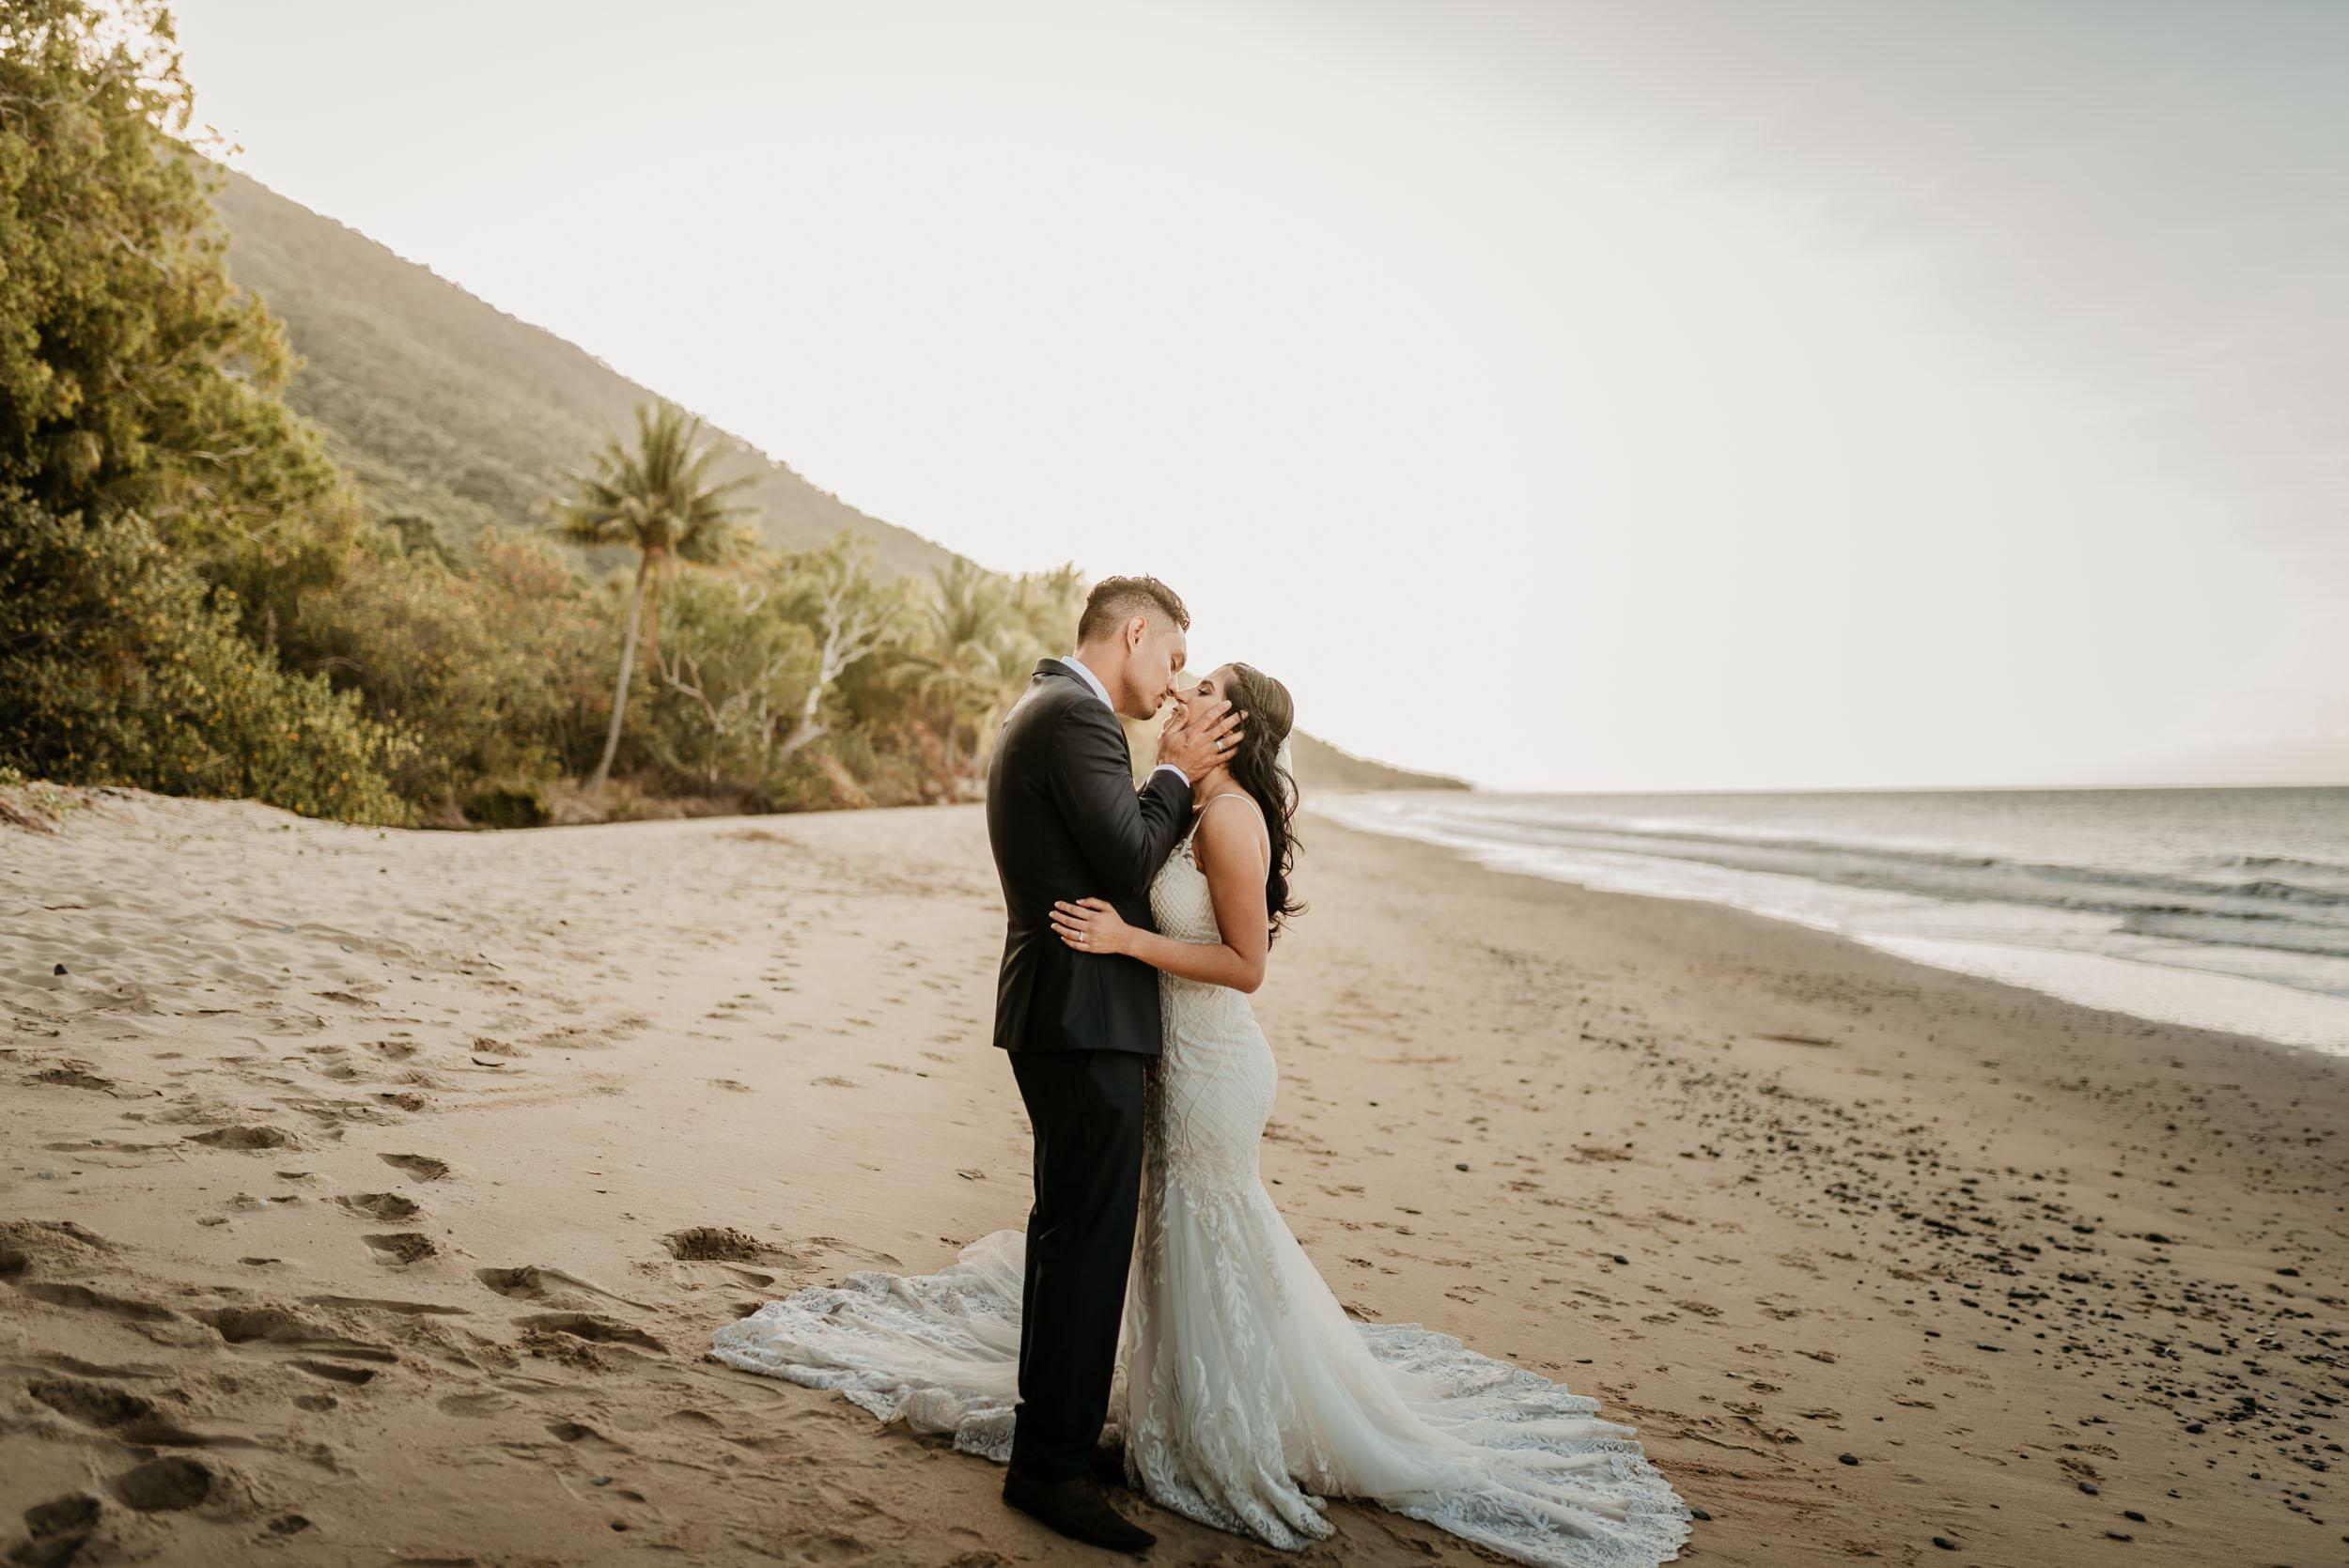 The Raw Photographer - Cairns Wedding Photographer - Beach Palm Cove Ceremony - Dress Irene Costa's Devine Bridal - Queensland-60.jpg